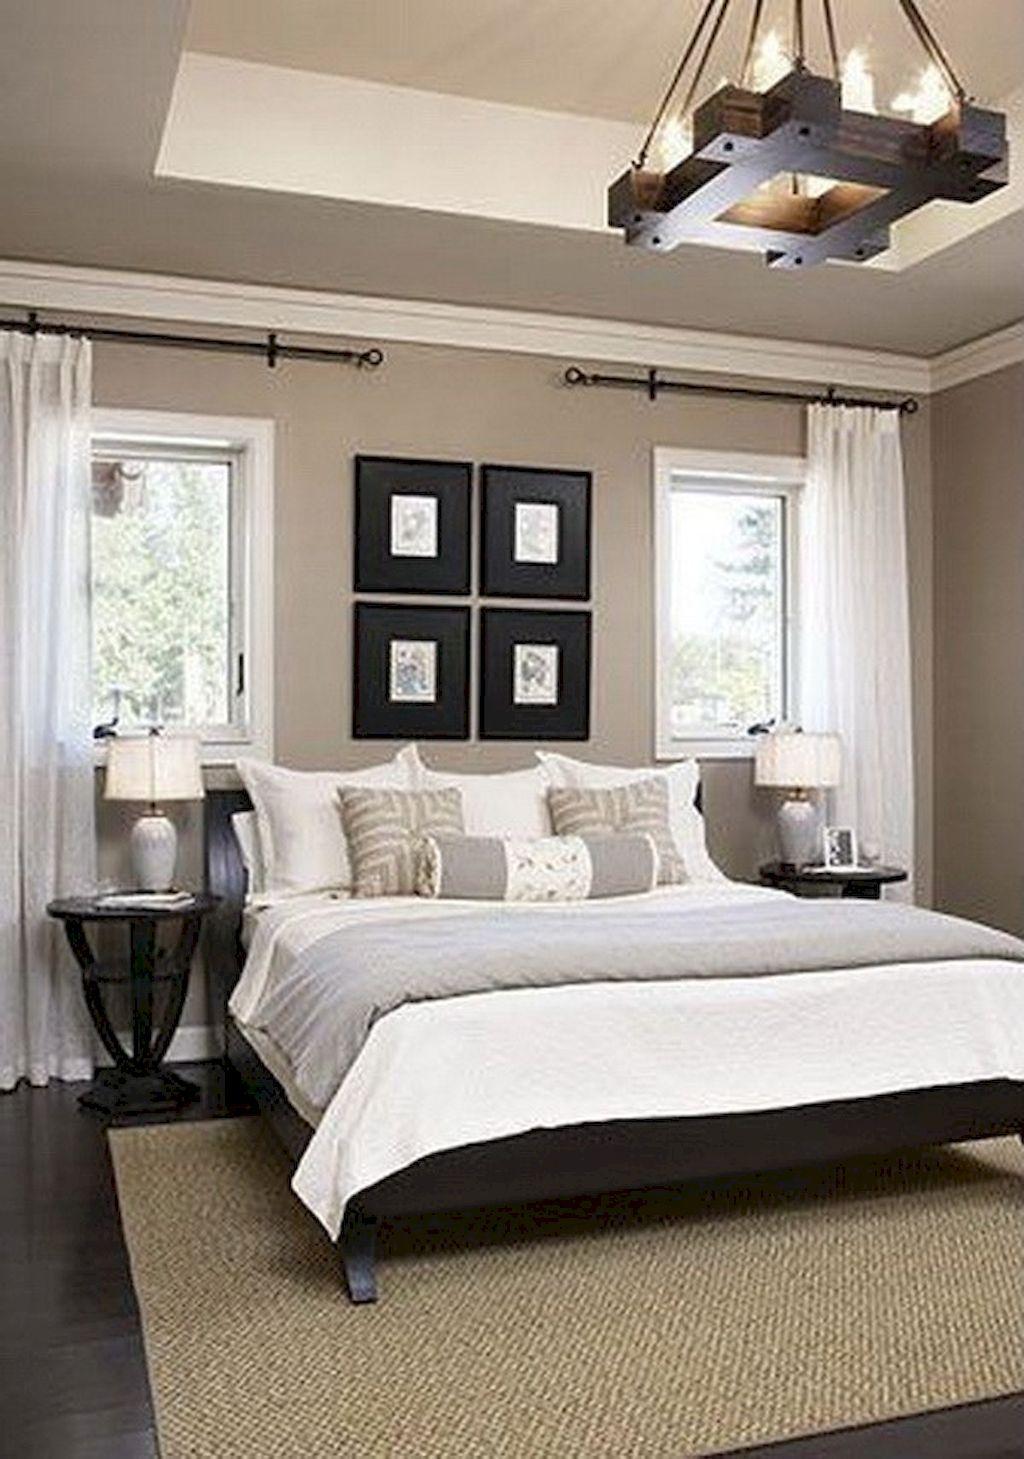 Cool incredible master bedroom ideas homevialand